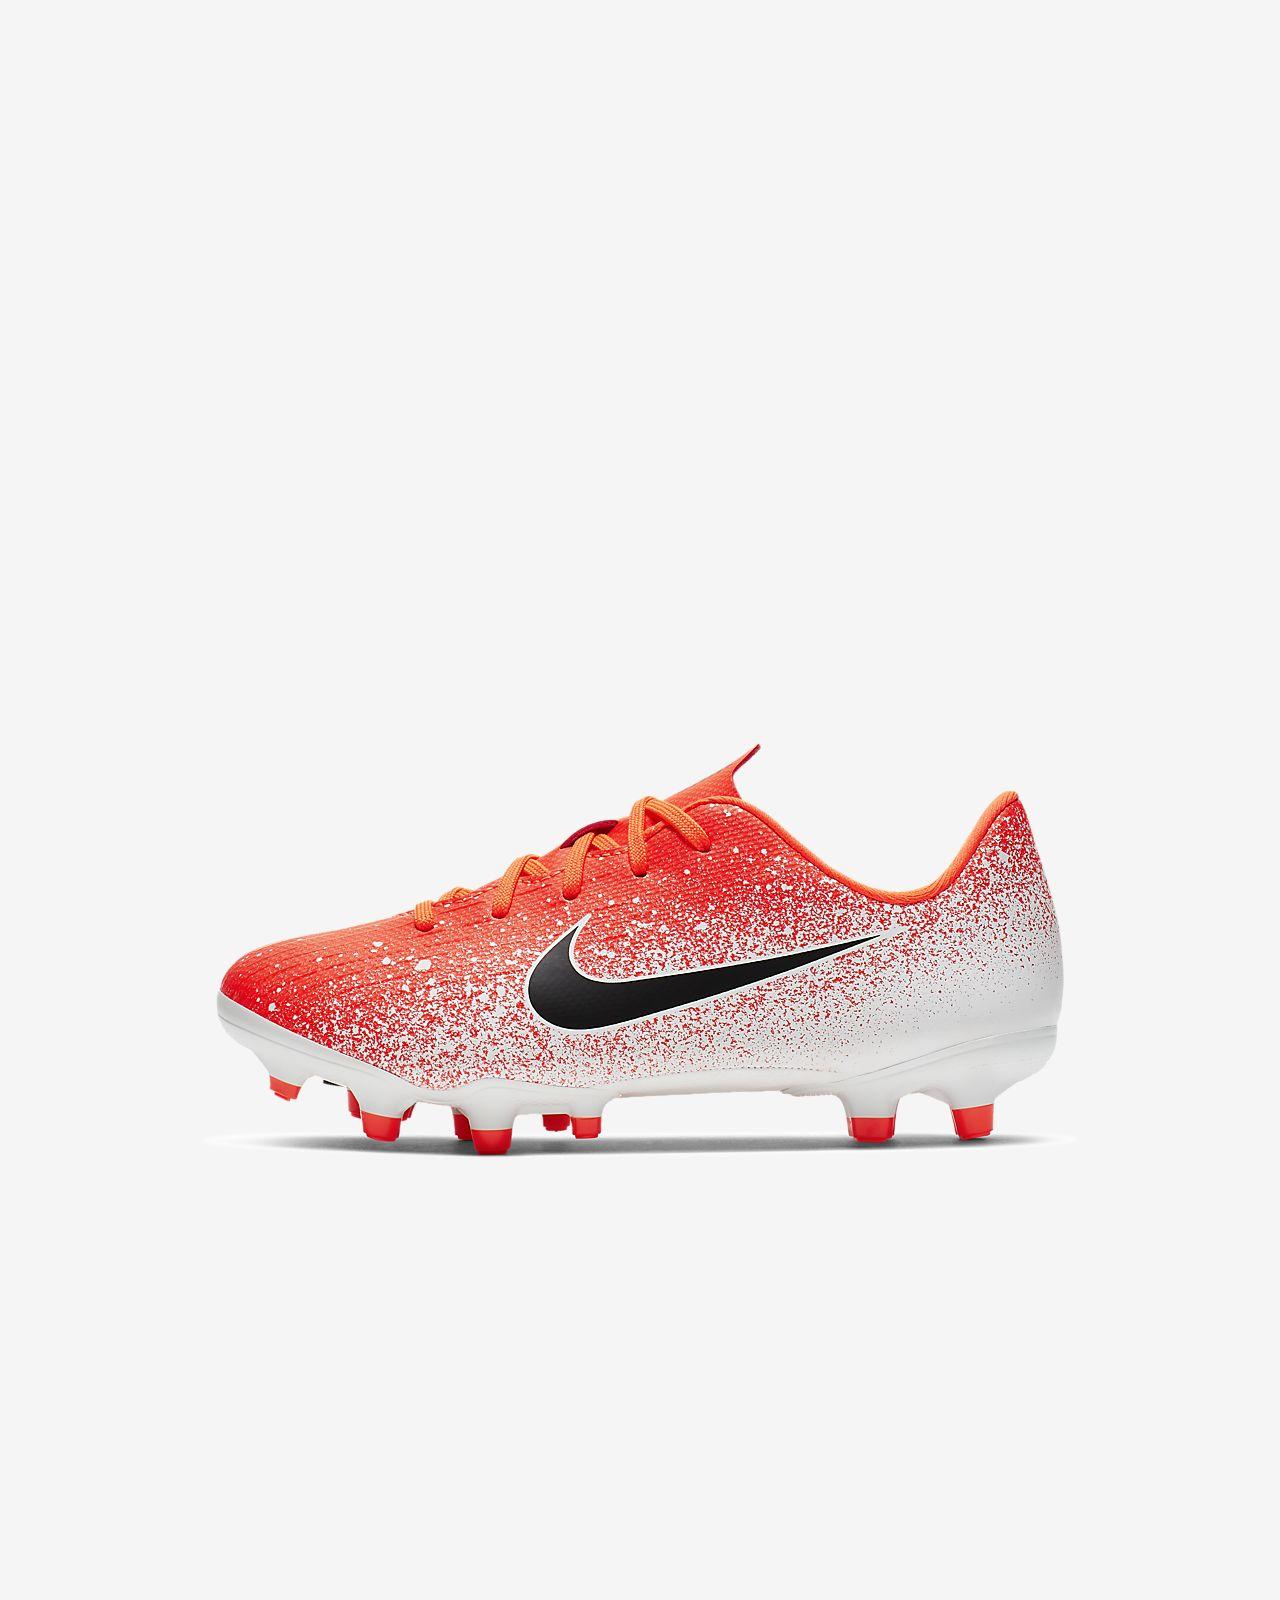 Nike Jr. MercurialX Vapor XII Academy Toddler/Younger Kids' Multi-Ground Football Boot